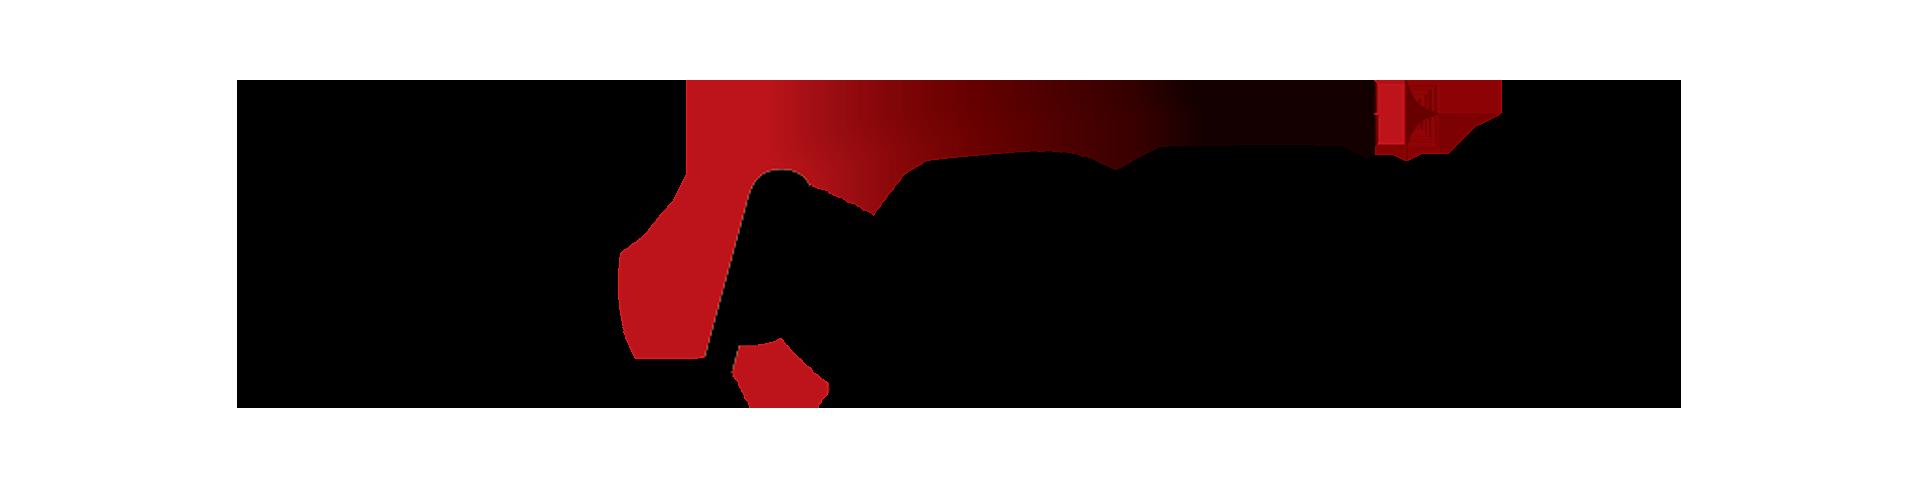 startix logo